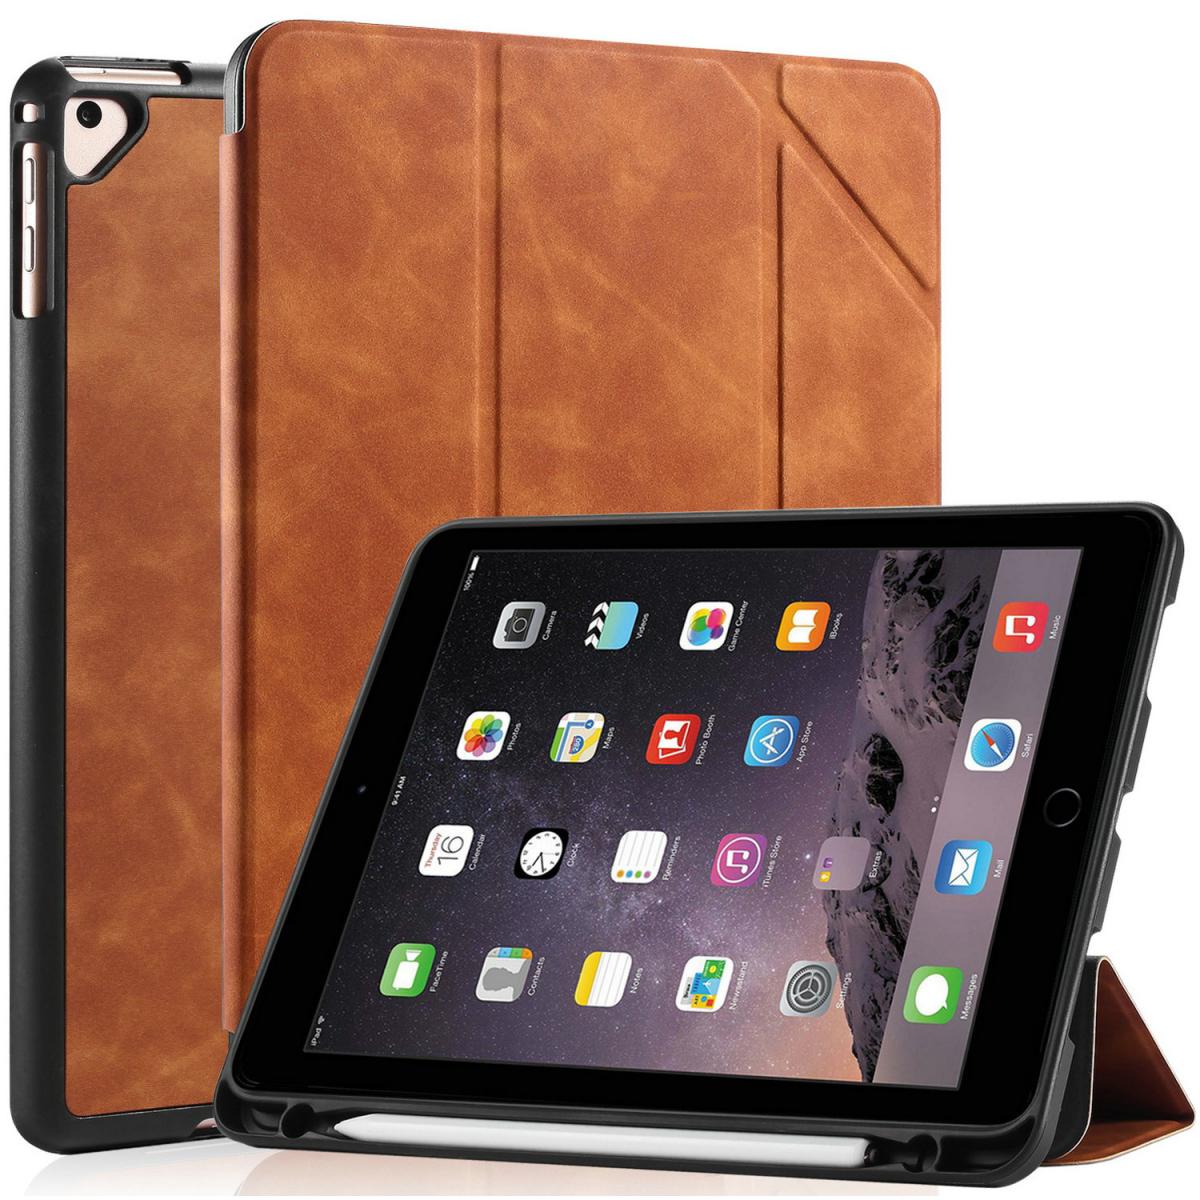 DG.MING Retro Style fodral till iPad Air/Air2 och iPad 9.7, brun